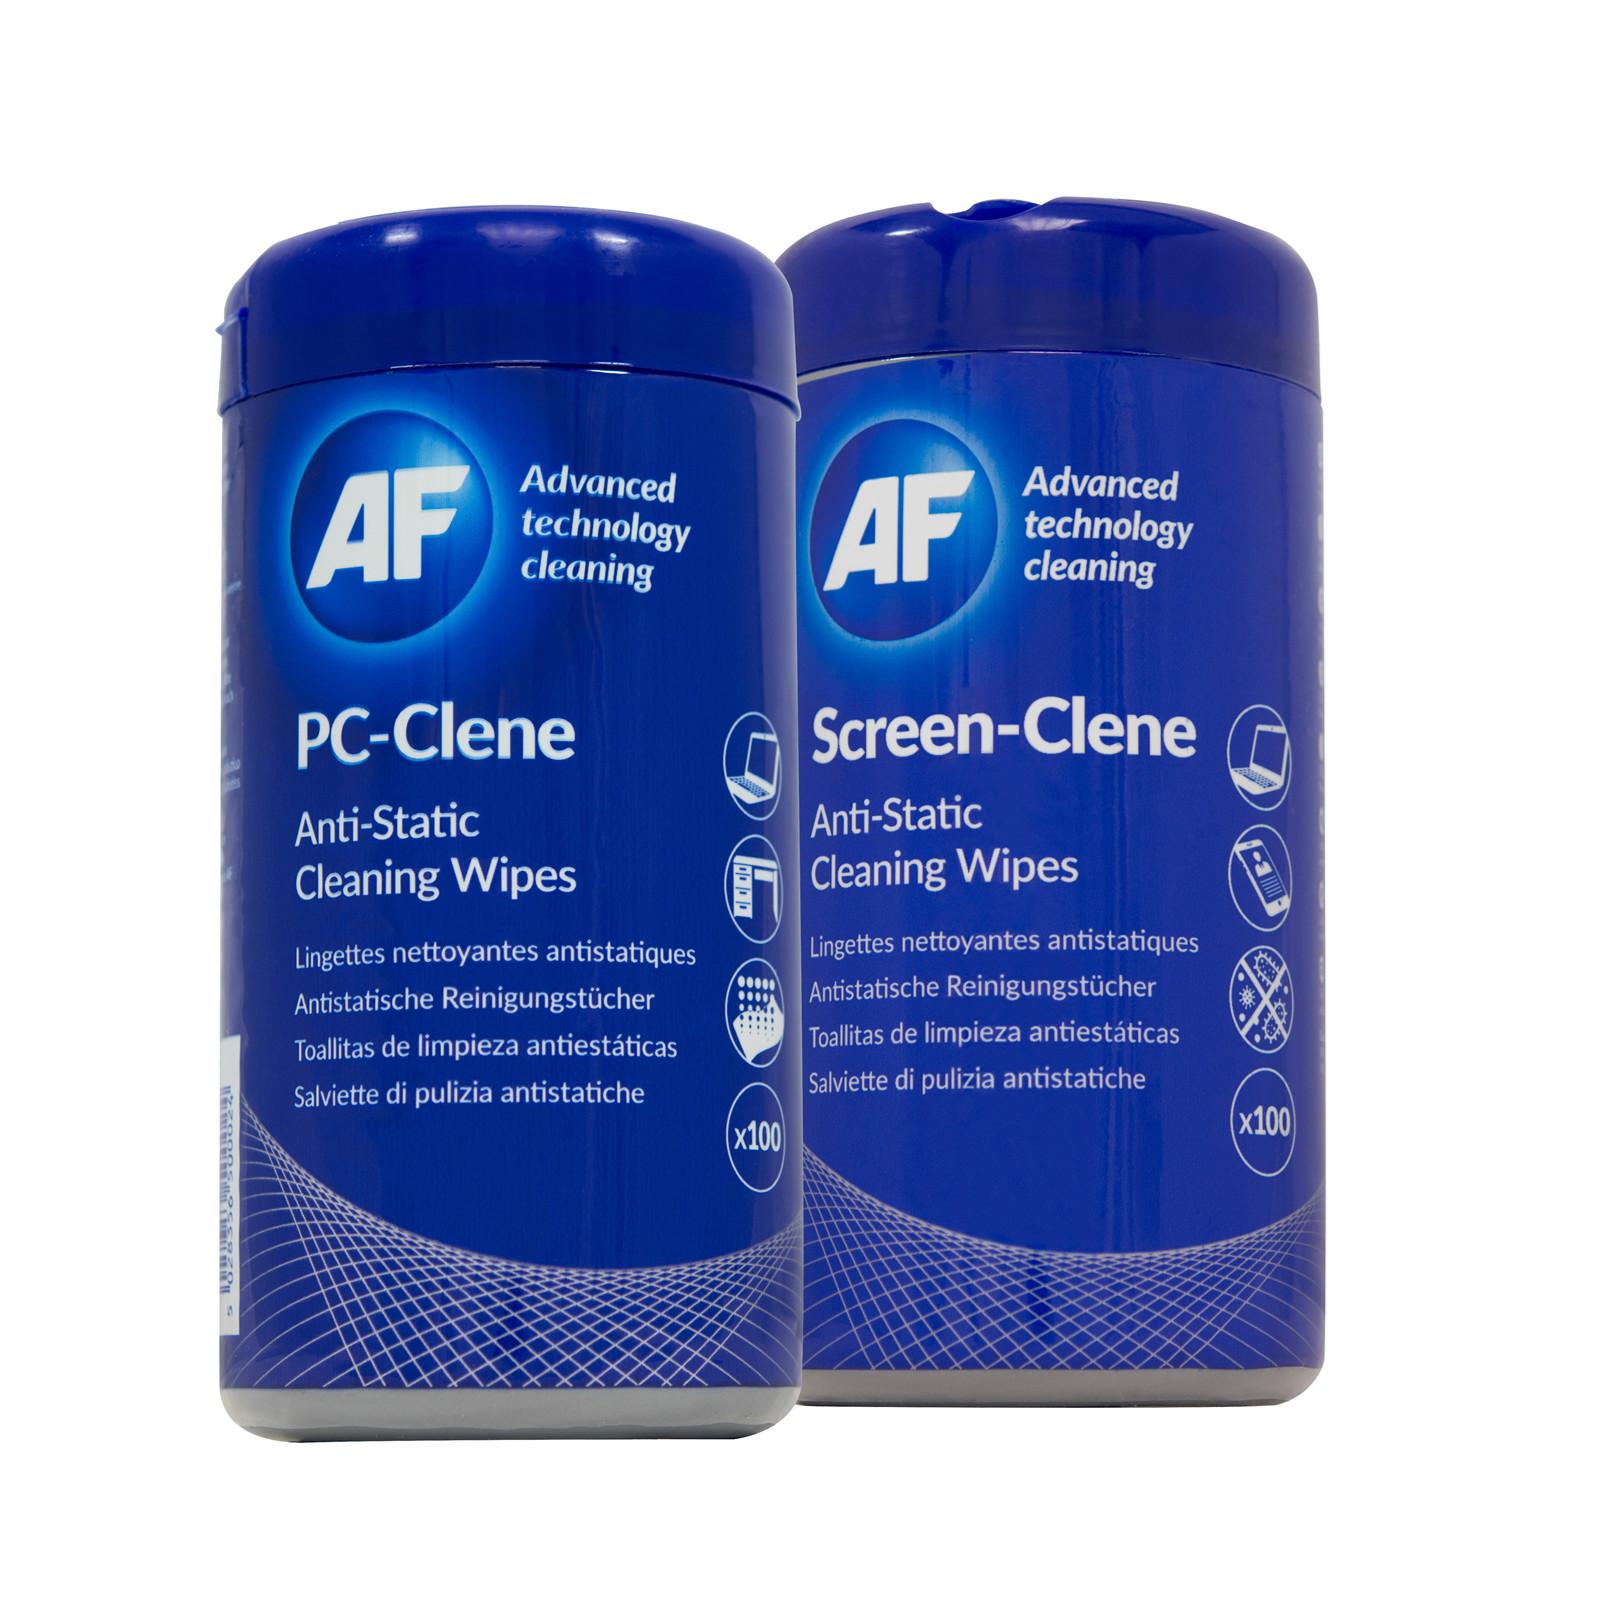 AF BUNDLE PC surface-clene tub (100pcs) + Screen-clene tub (100